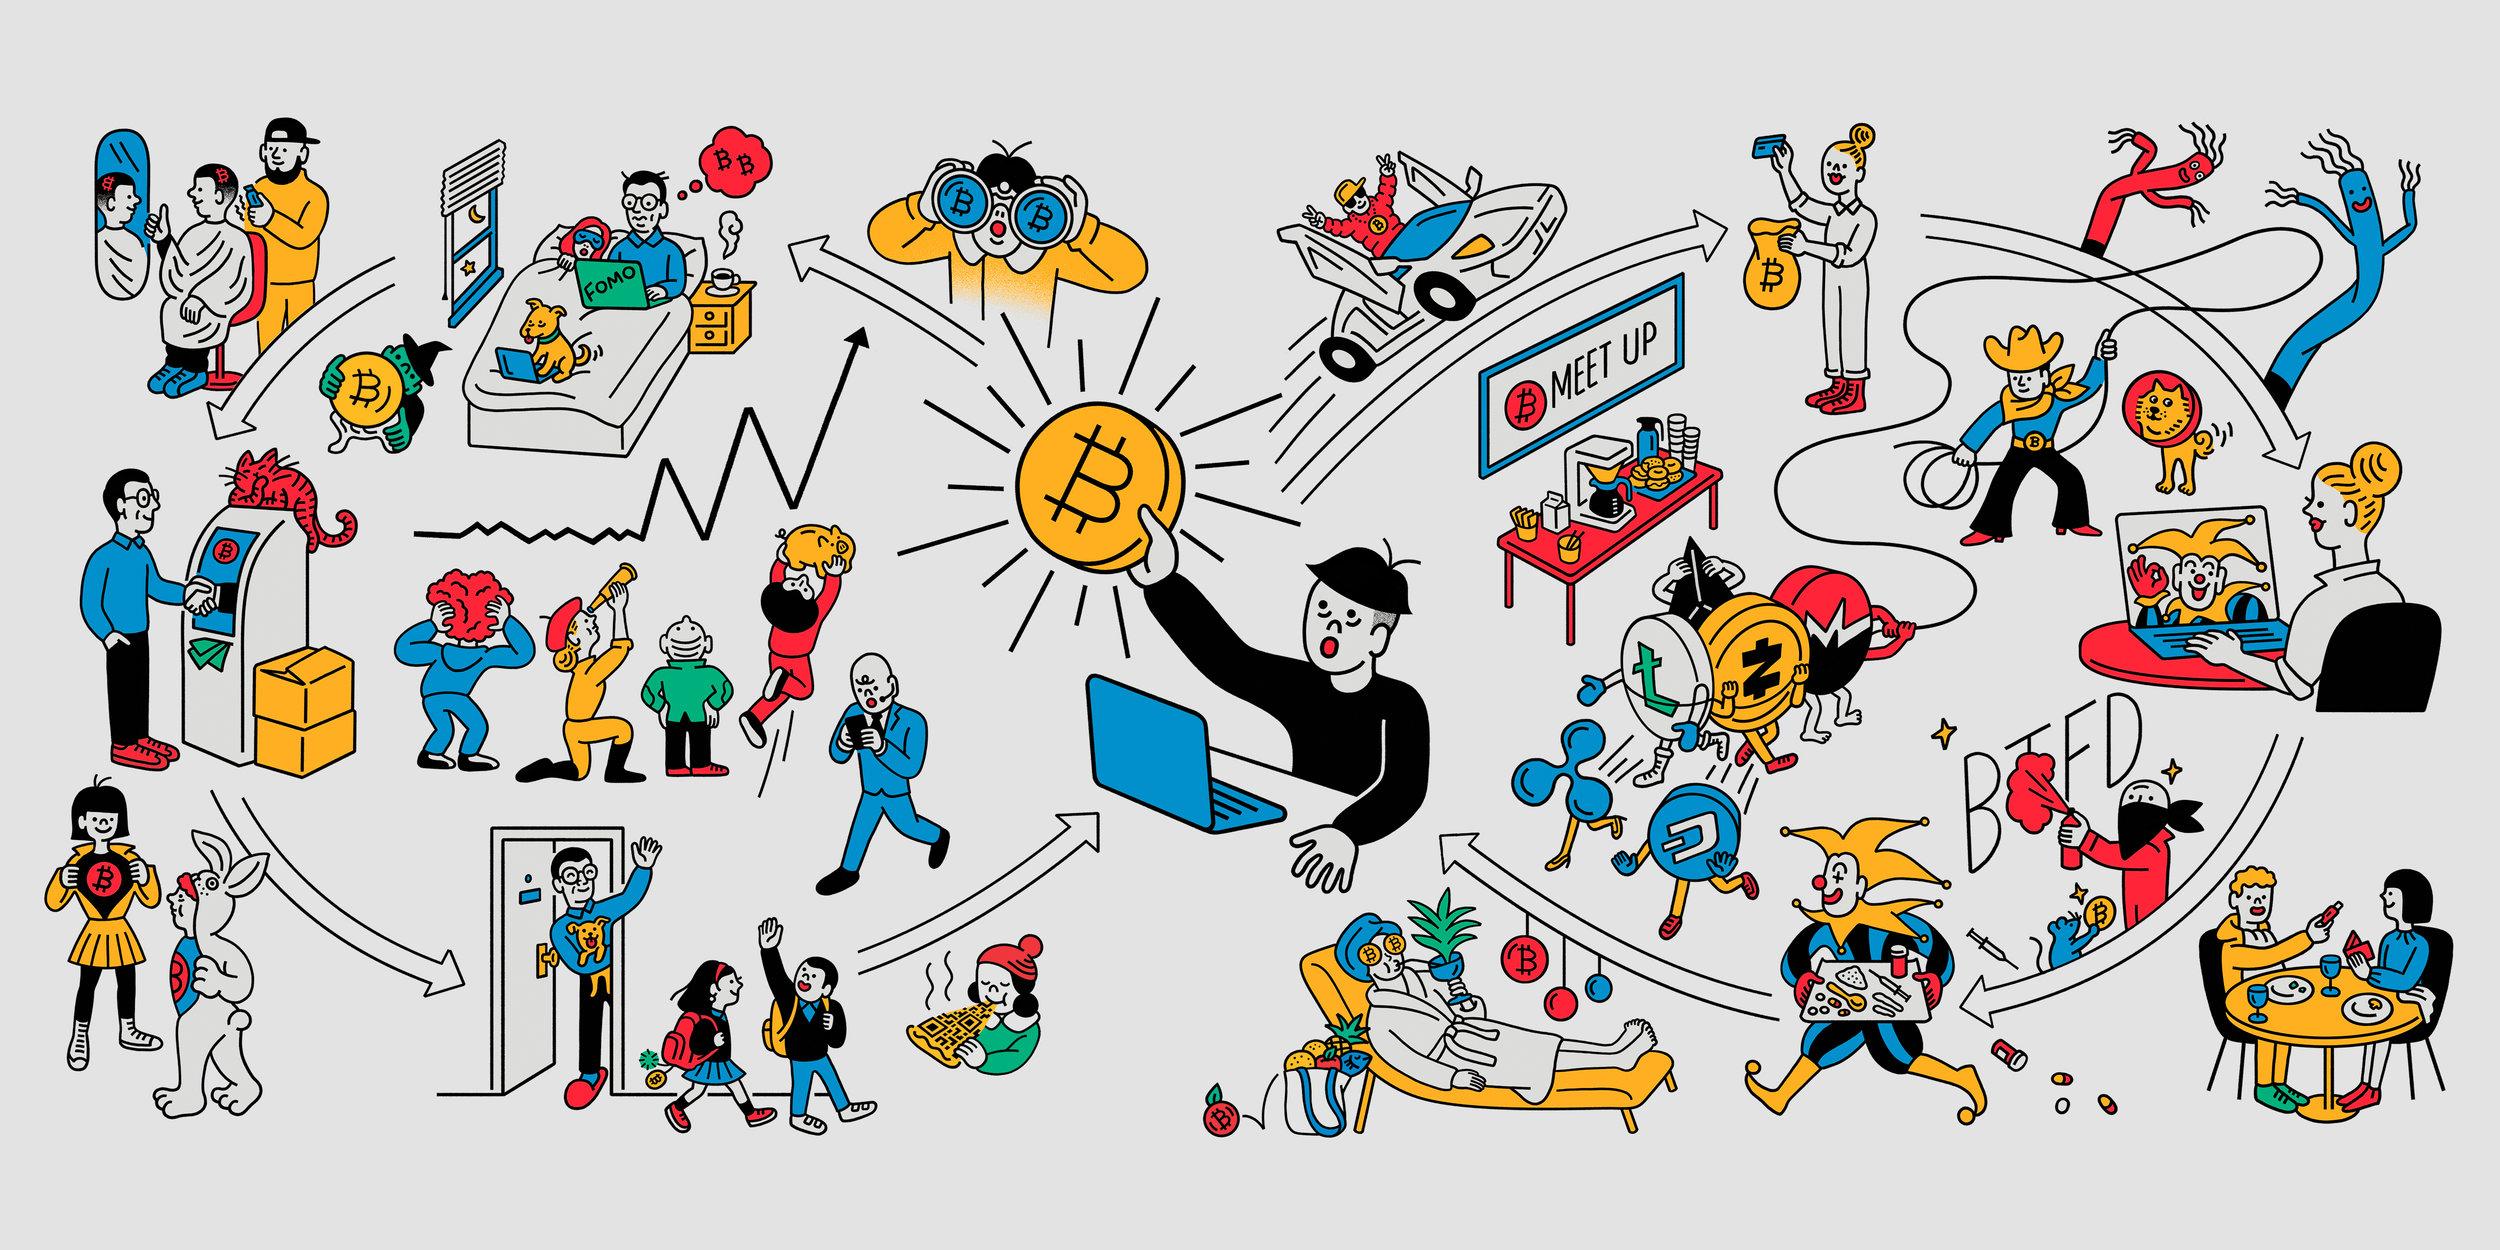 tomium-world-of-bitcoin.jpg